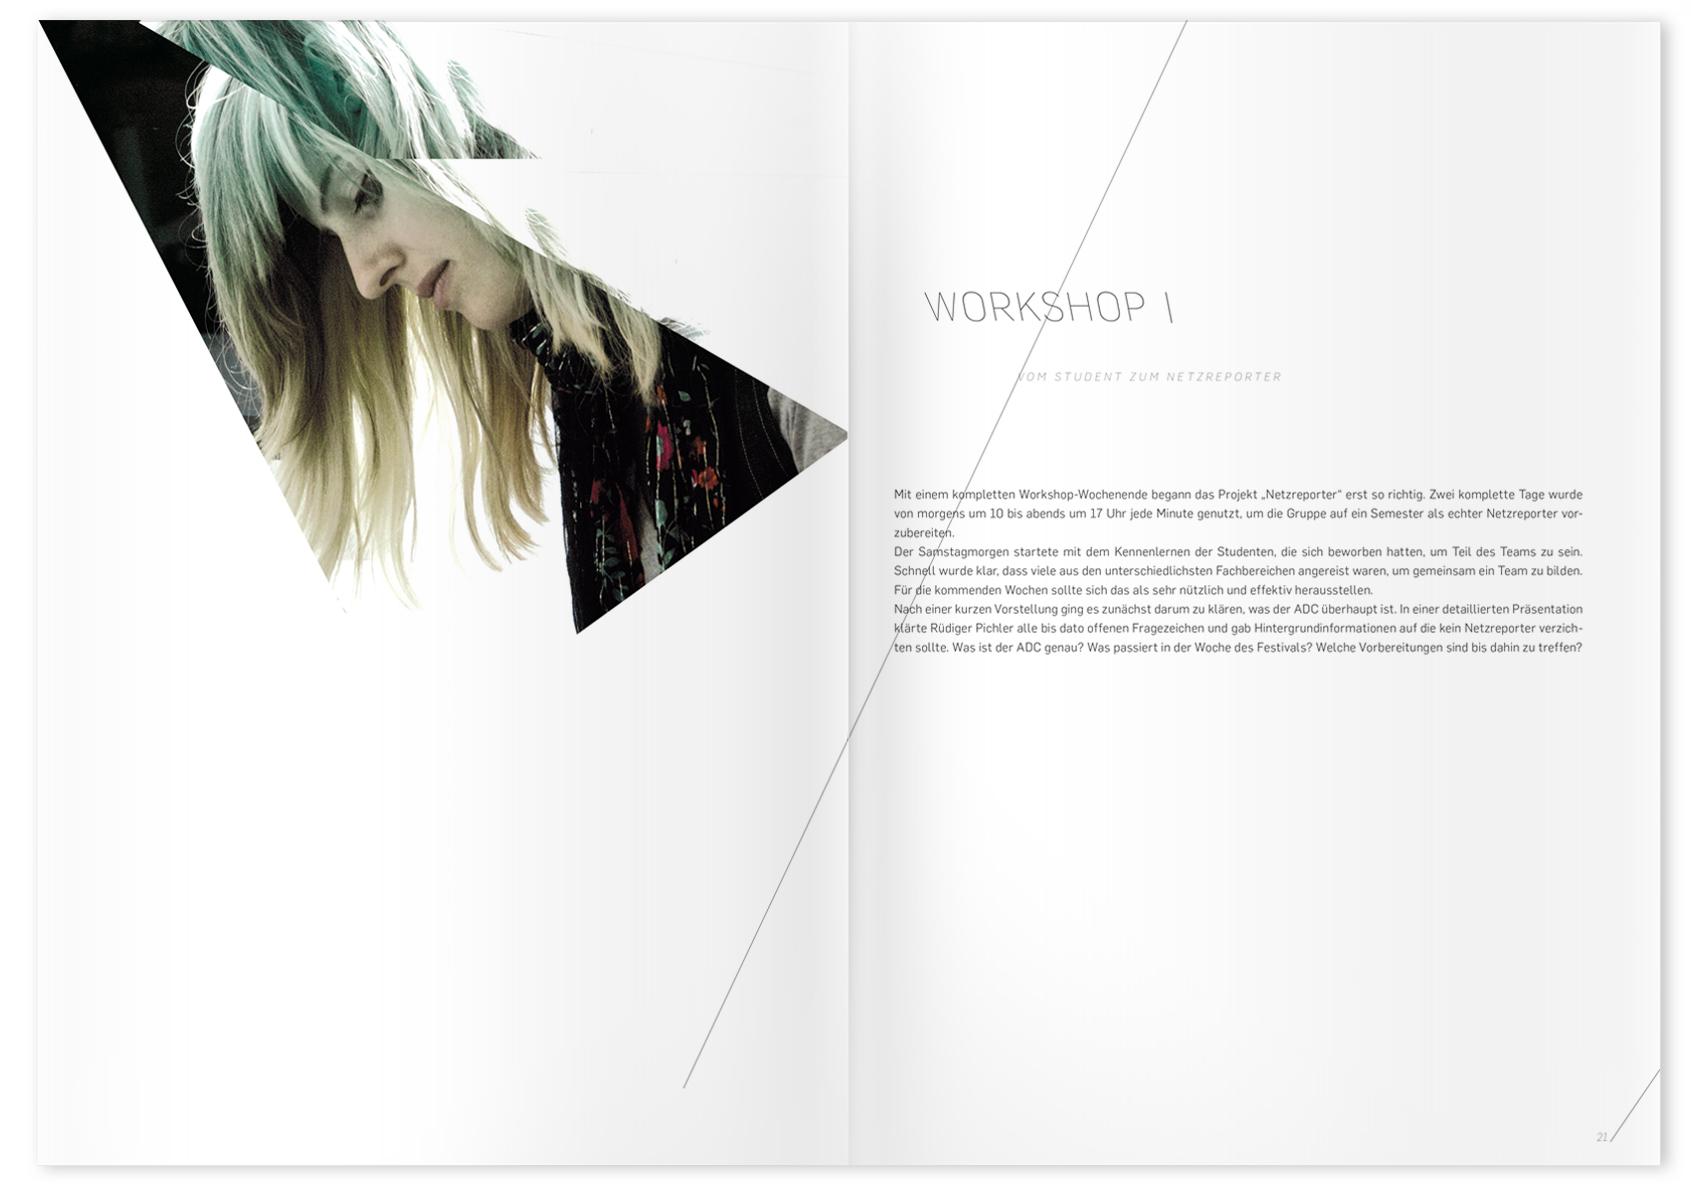 08_hFMA Netzreporter_ADC Festival_Editorial Design_Grafikdesign_Gloria Kison.jpg